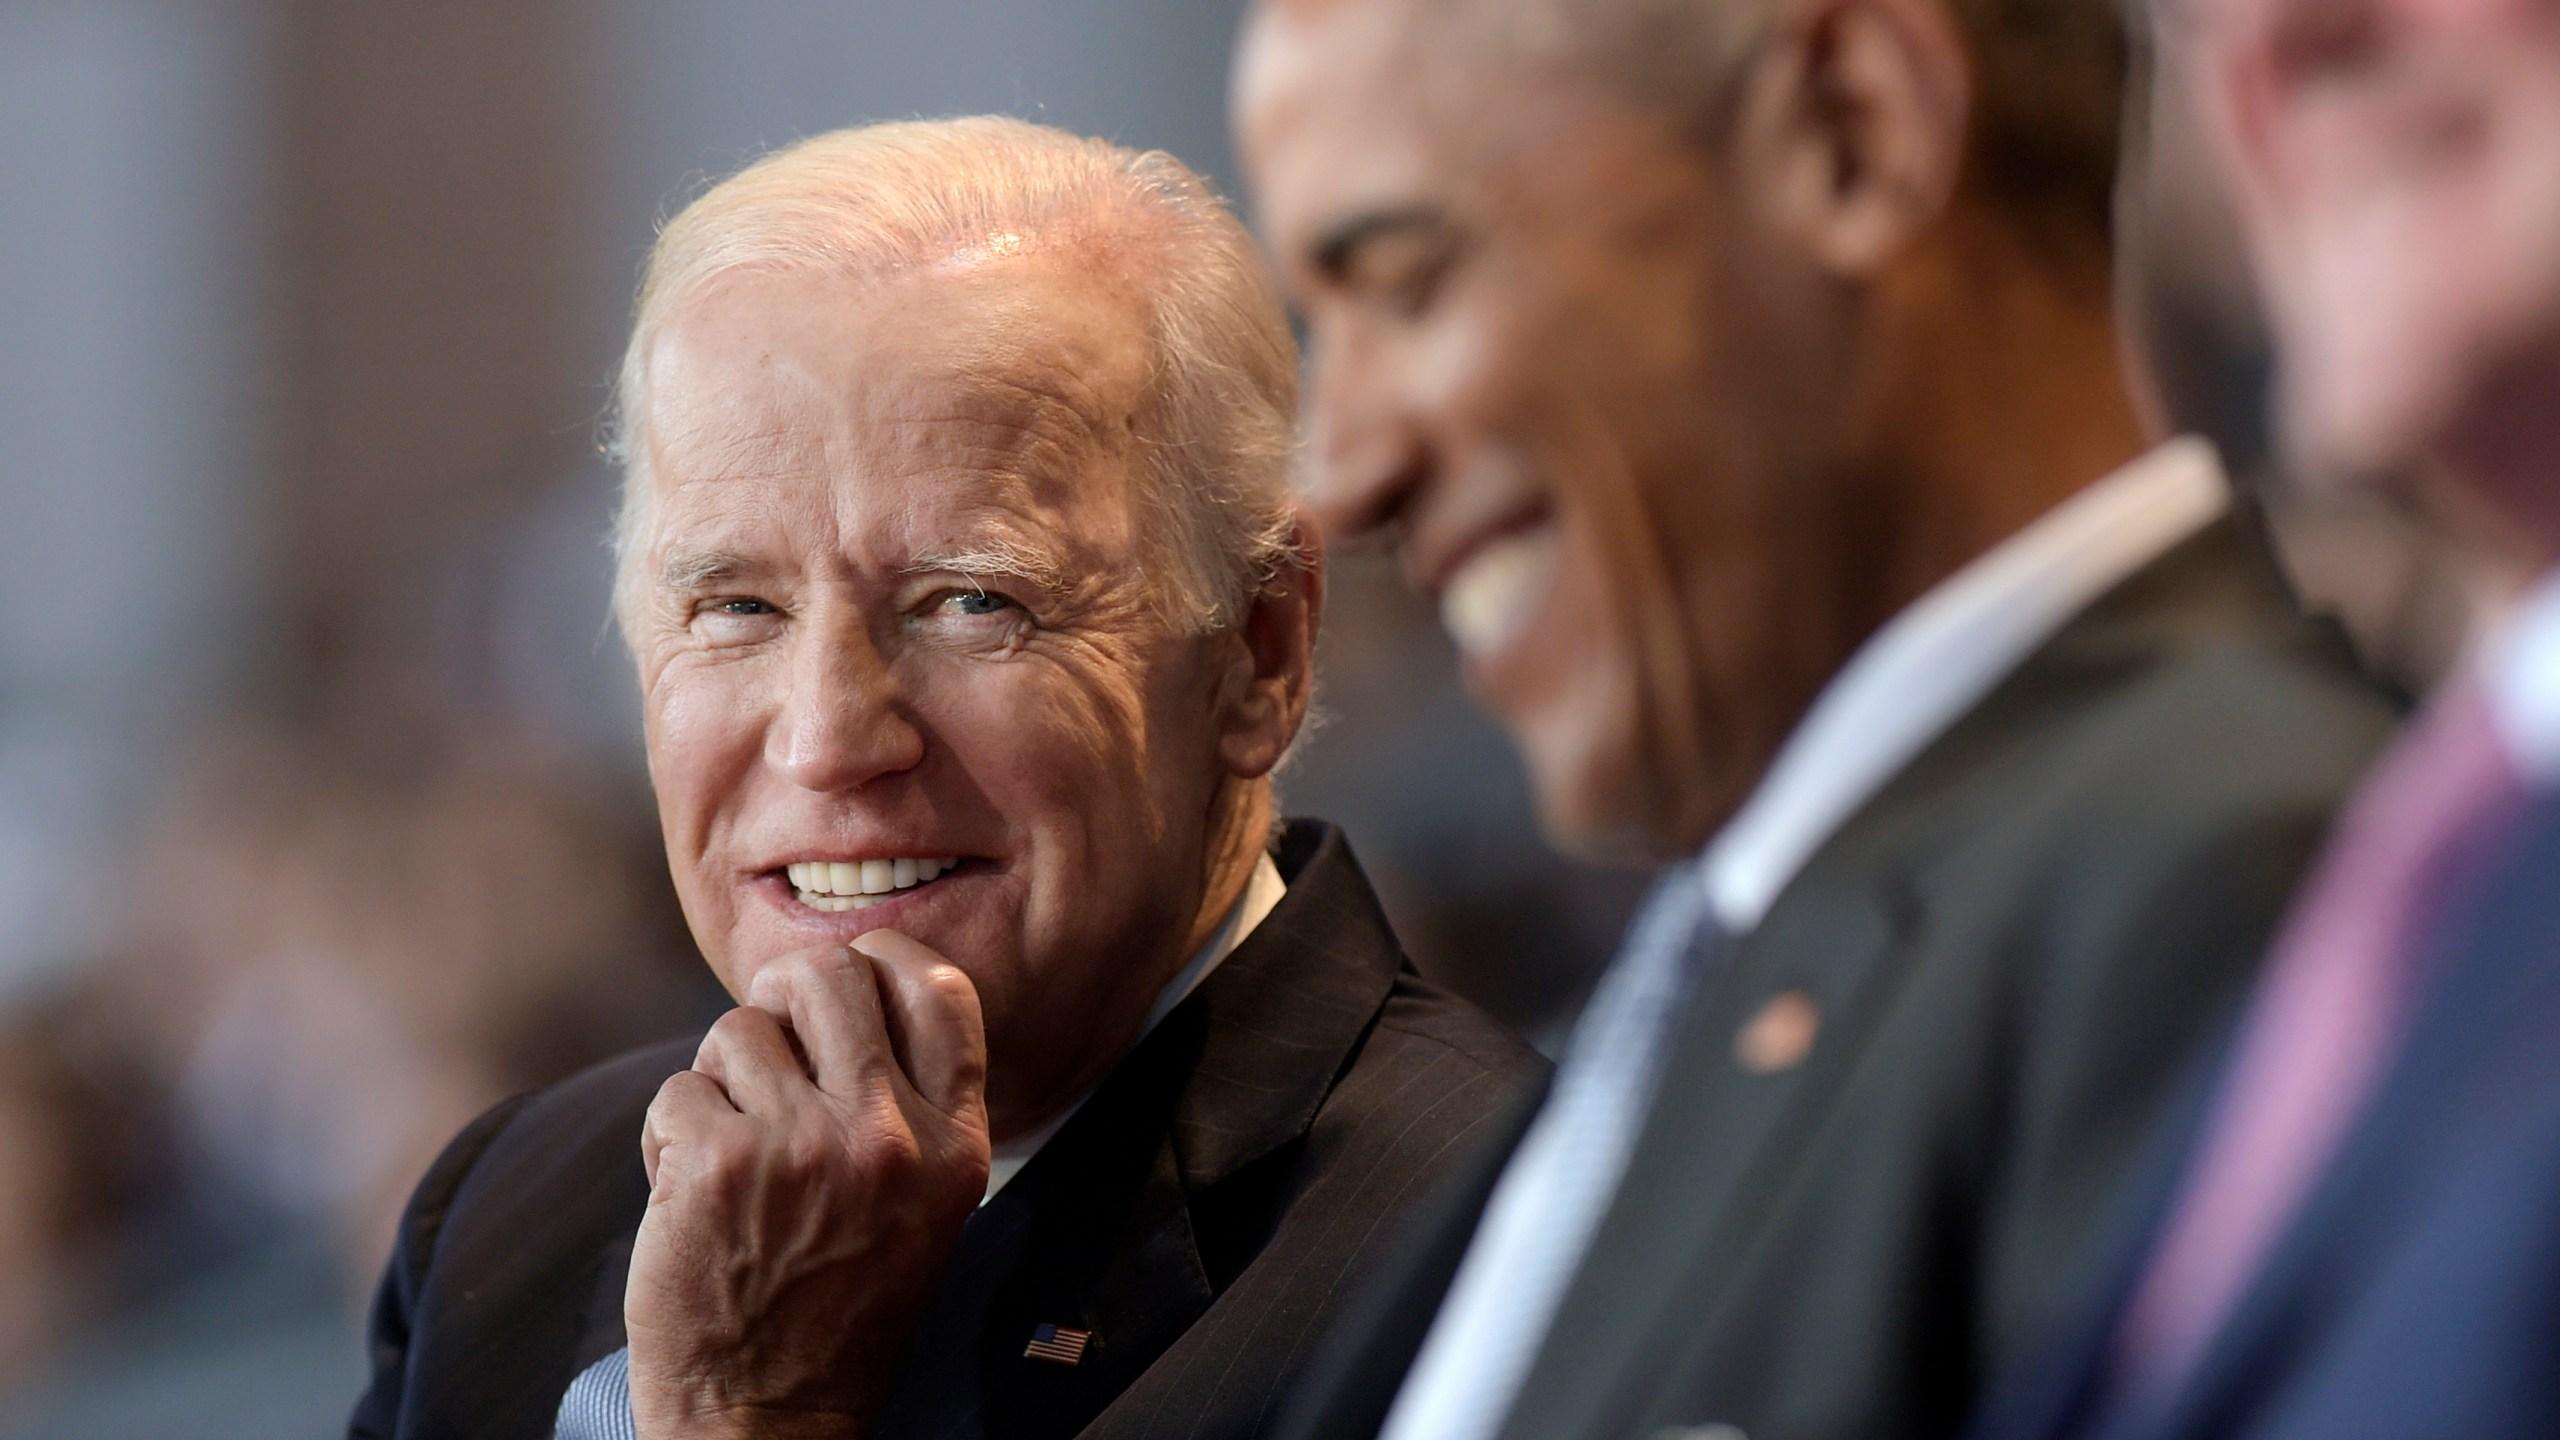 Barack Obama, Joe Biden